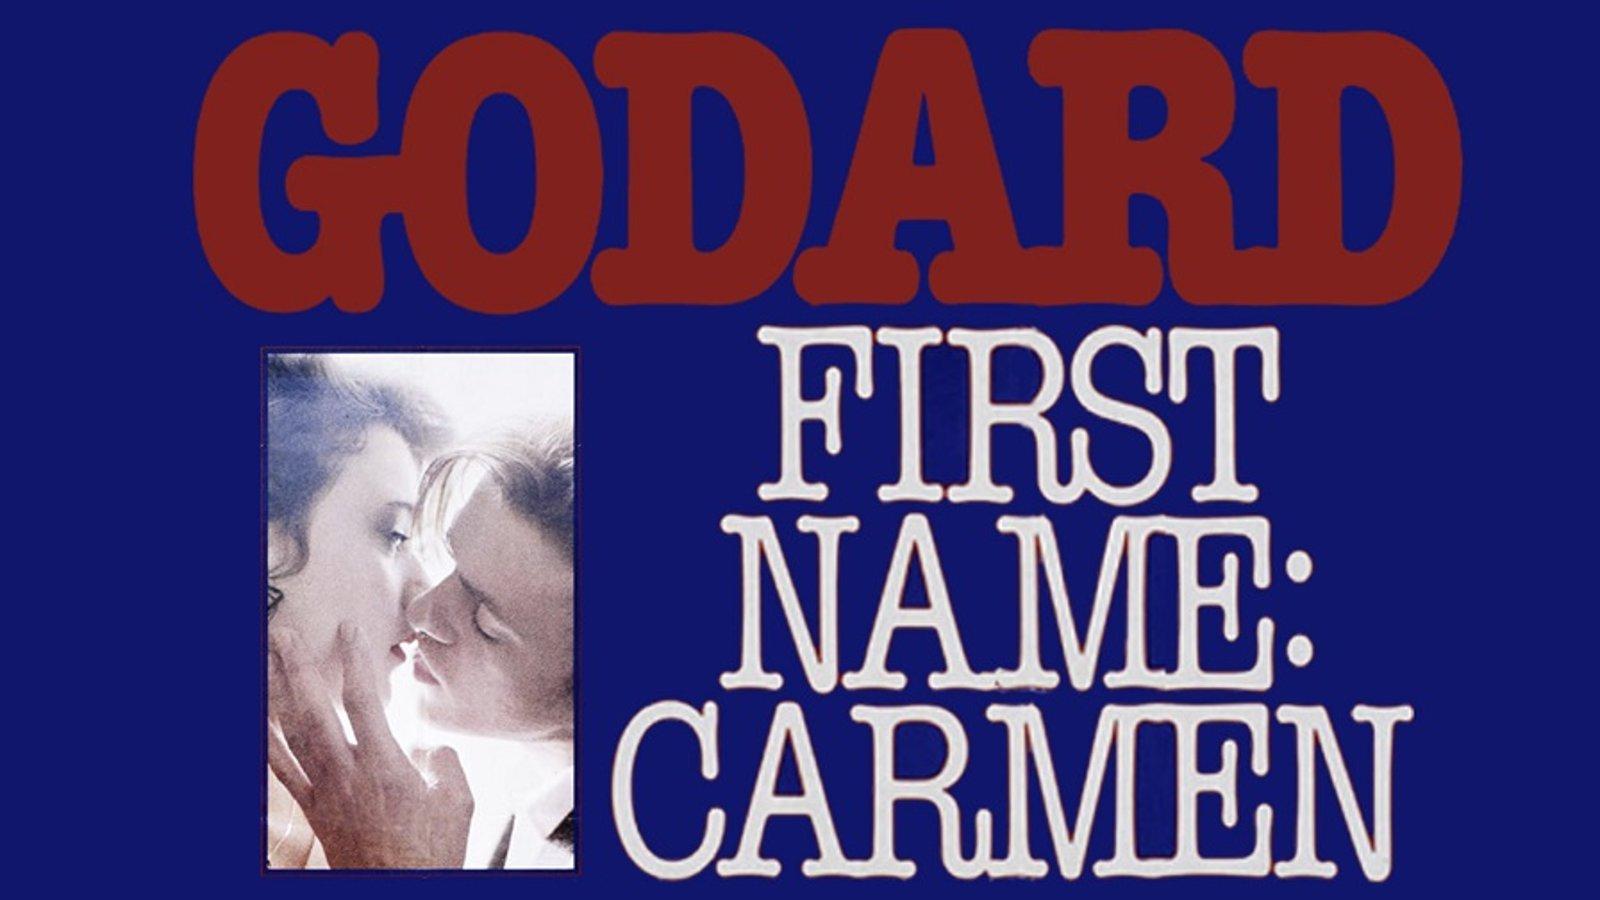 First Name: Carmen - Prénom Carmen